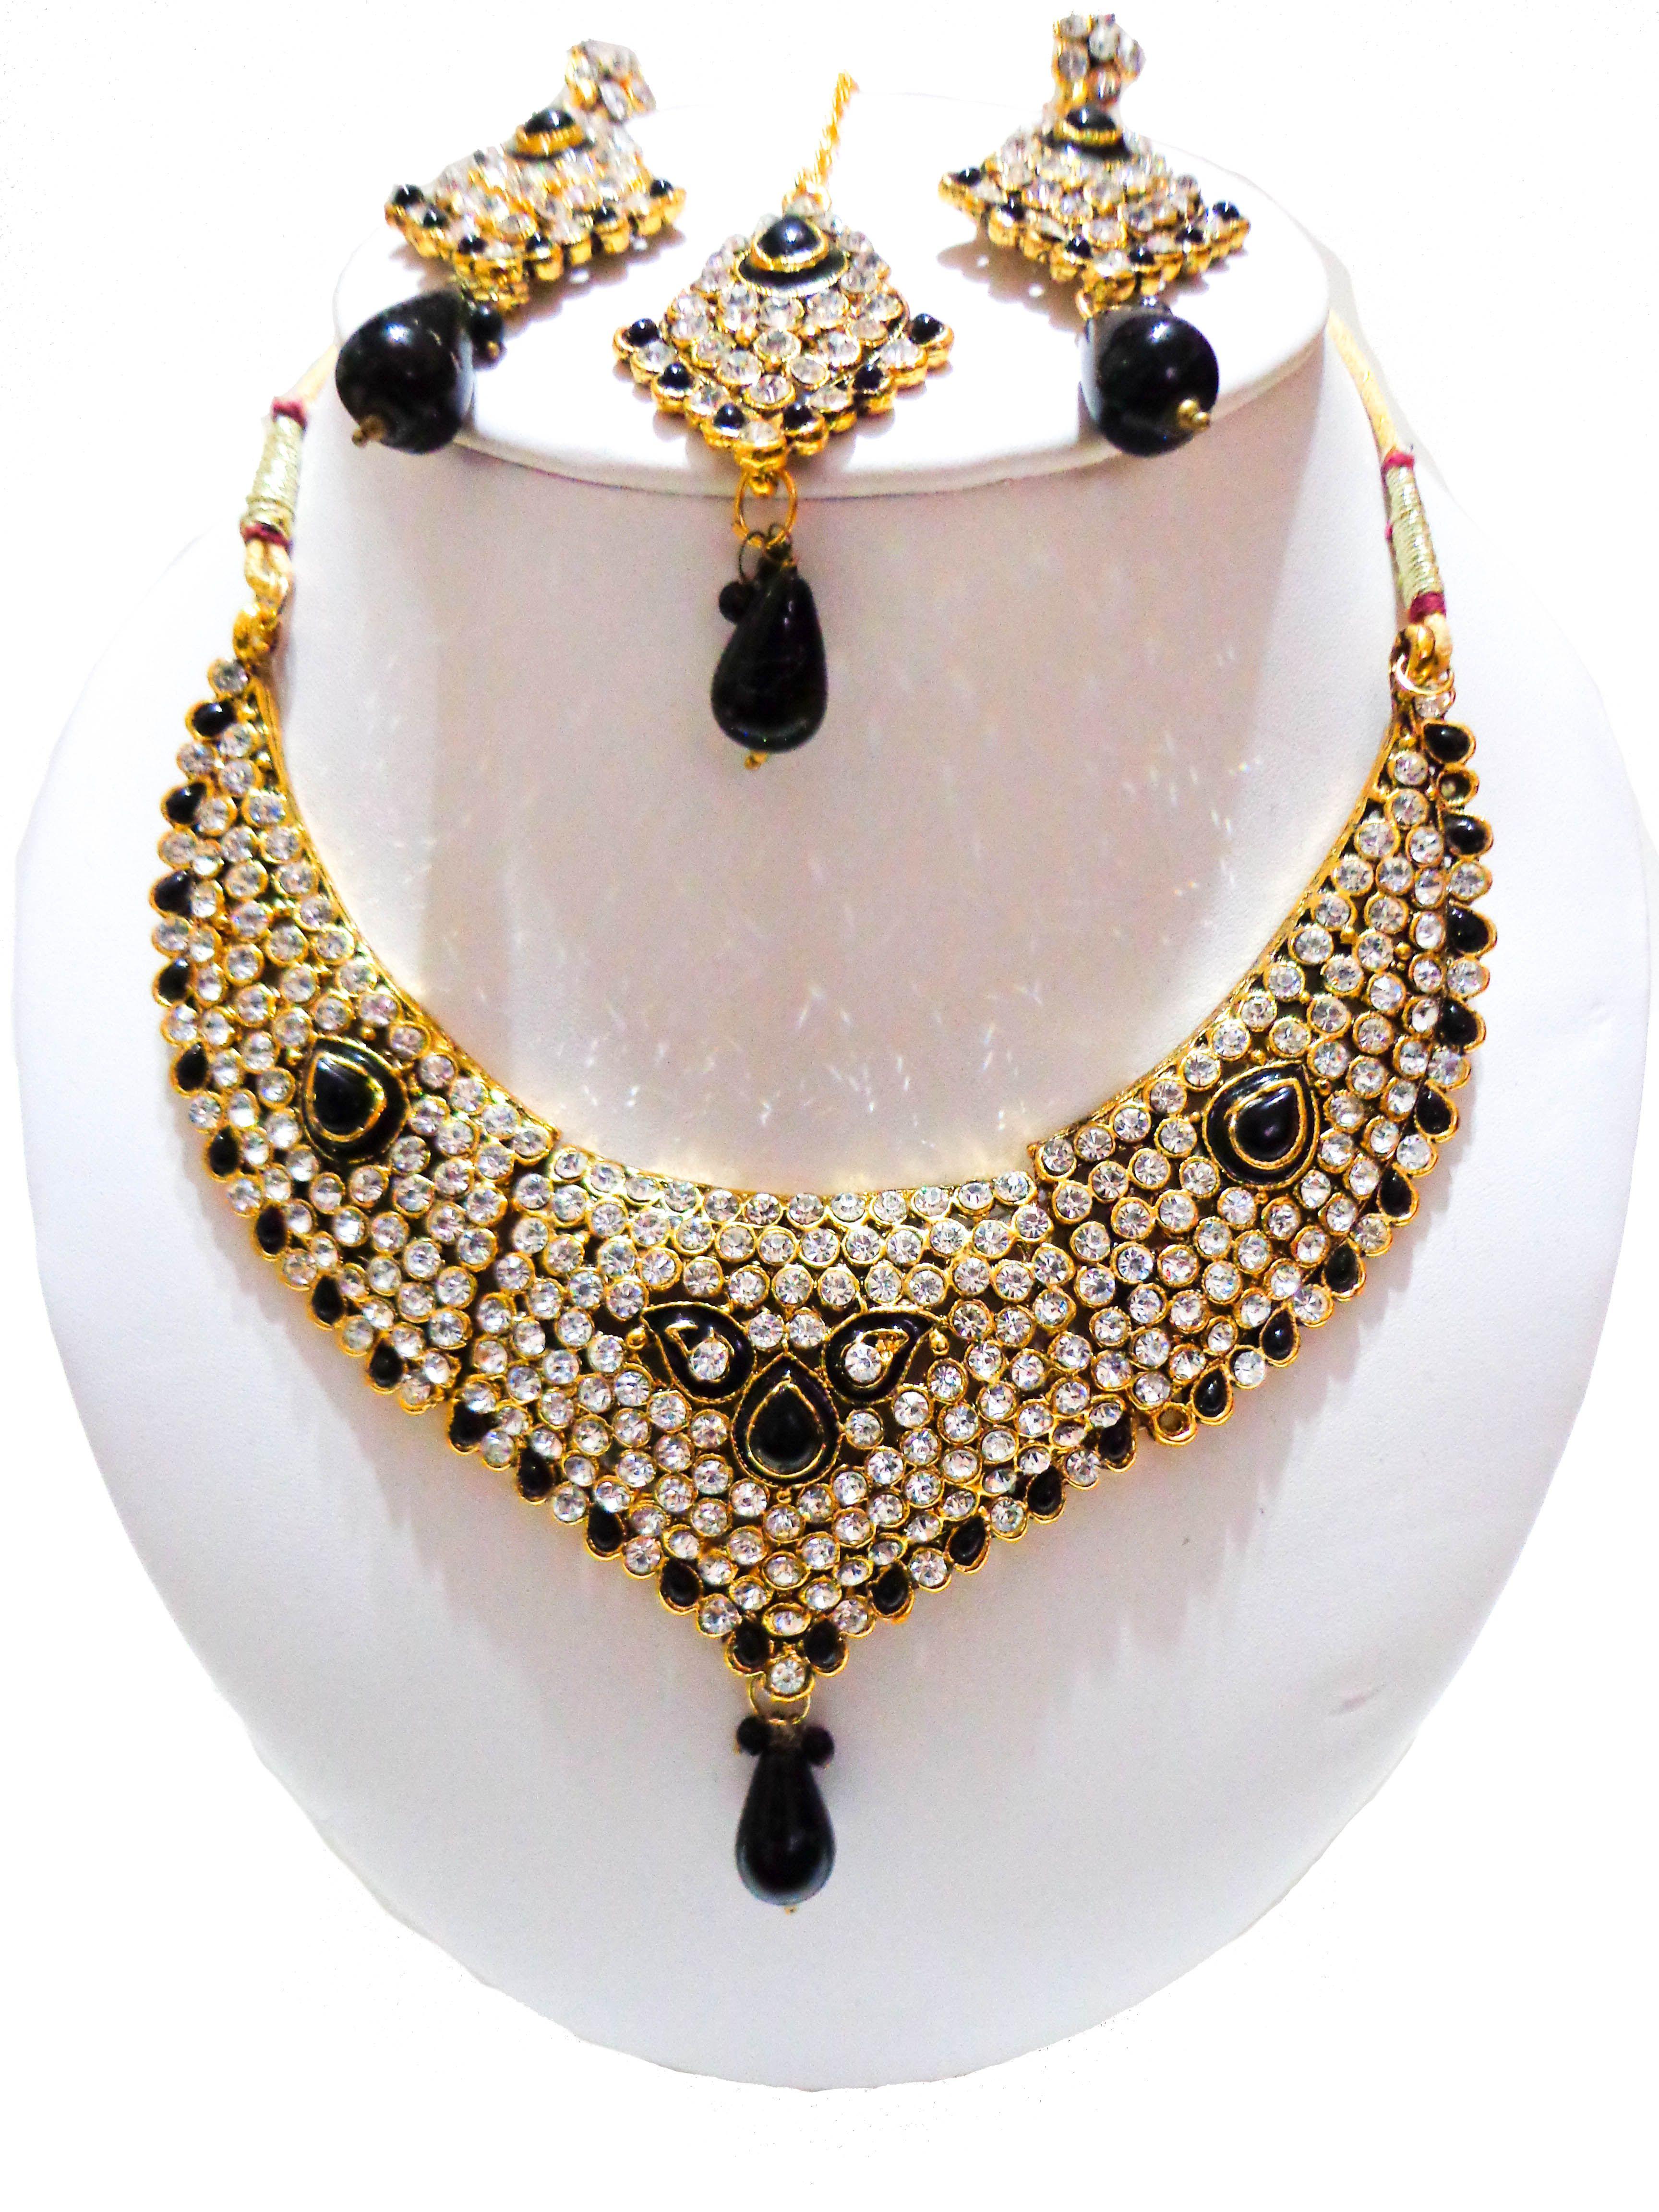 Beautiful Handmade Indian Bridal Jewelry Set 1 pc necklace 2 pc